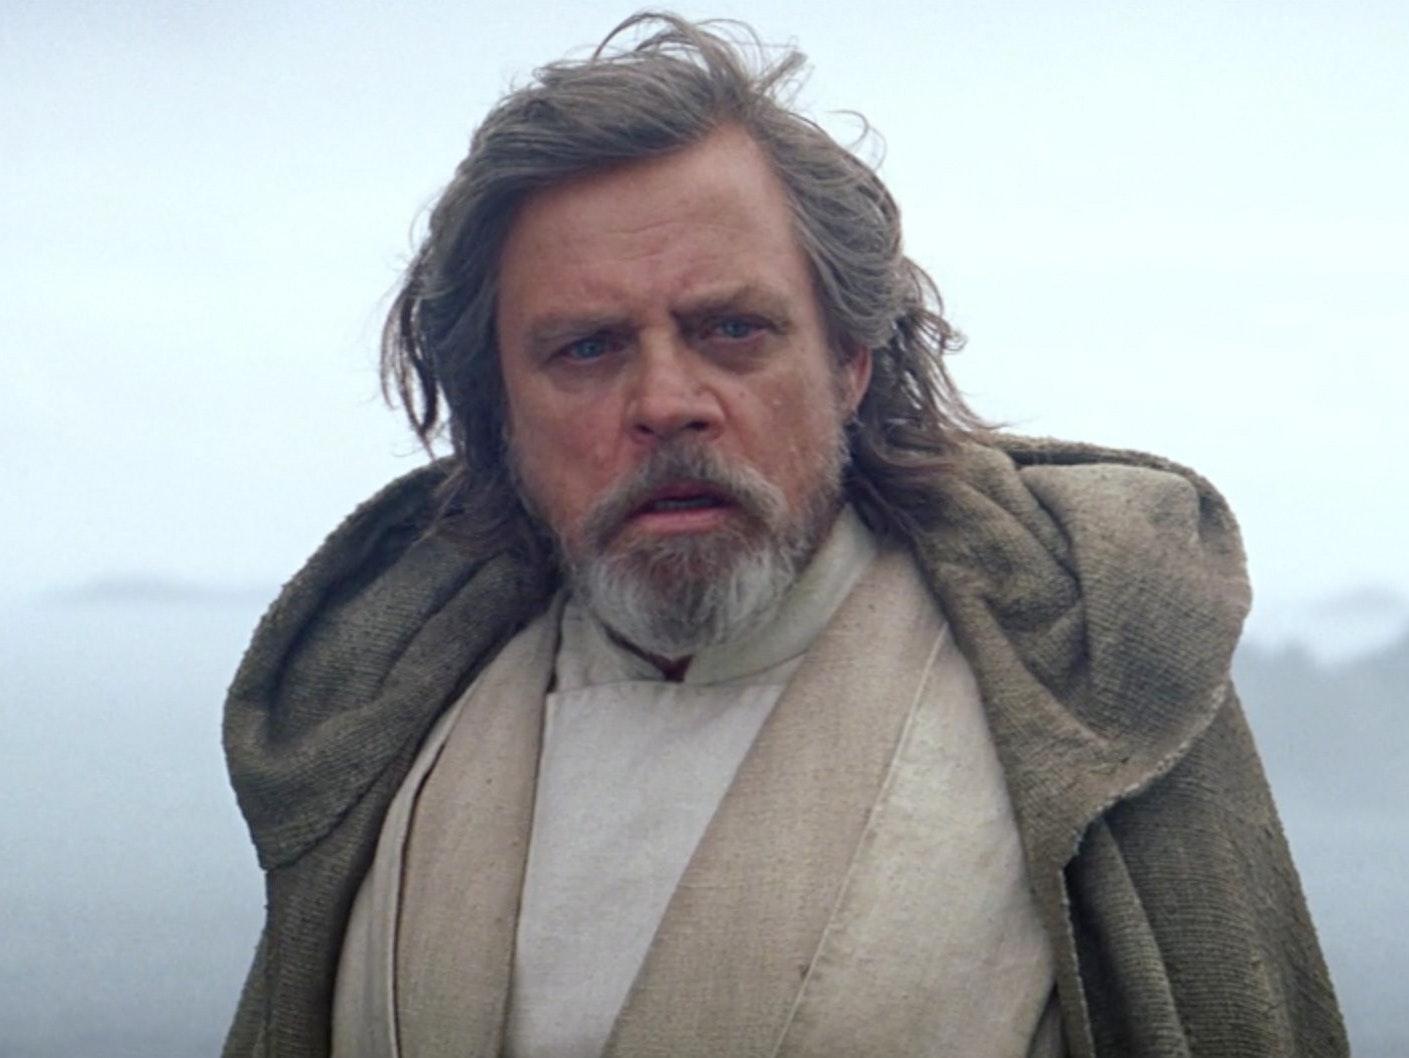 Luke Skywalker at the end of 'The Force Awakens'